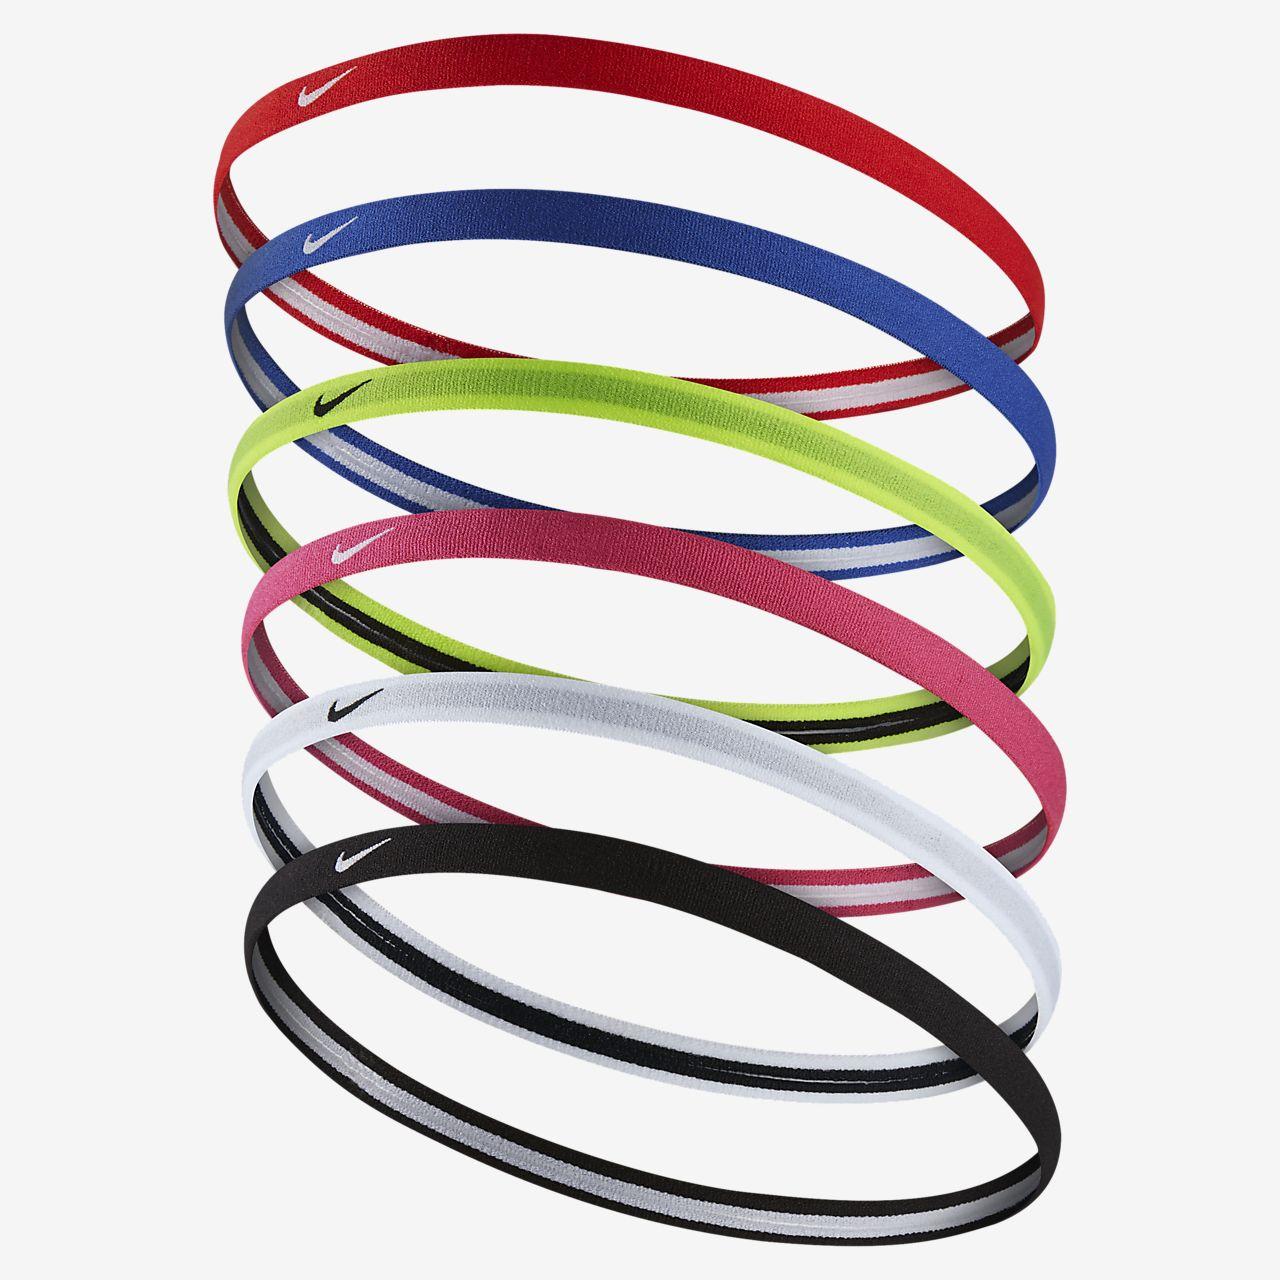 Nike Swoosh Sport 2.0 Headbands (6 Pack)